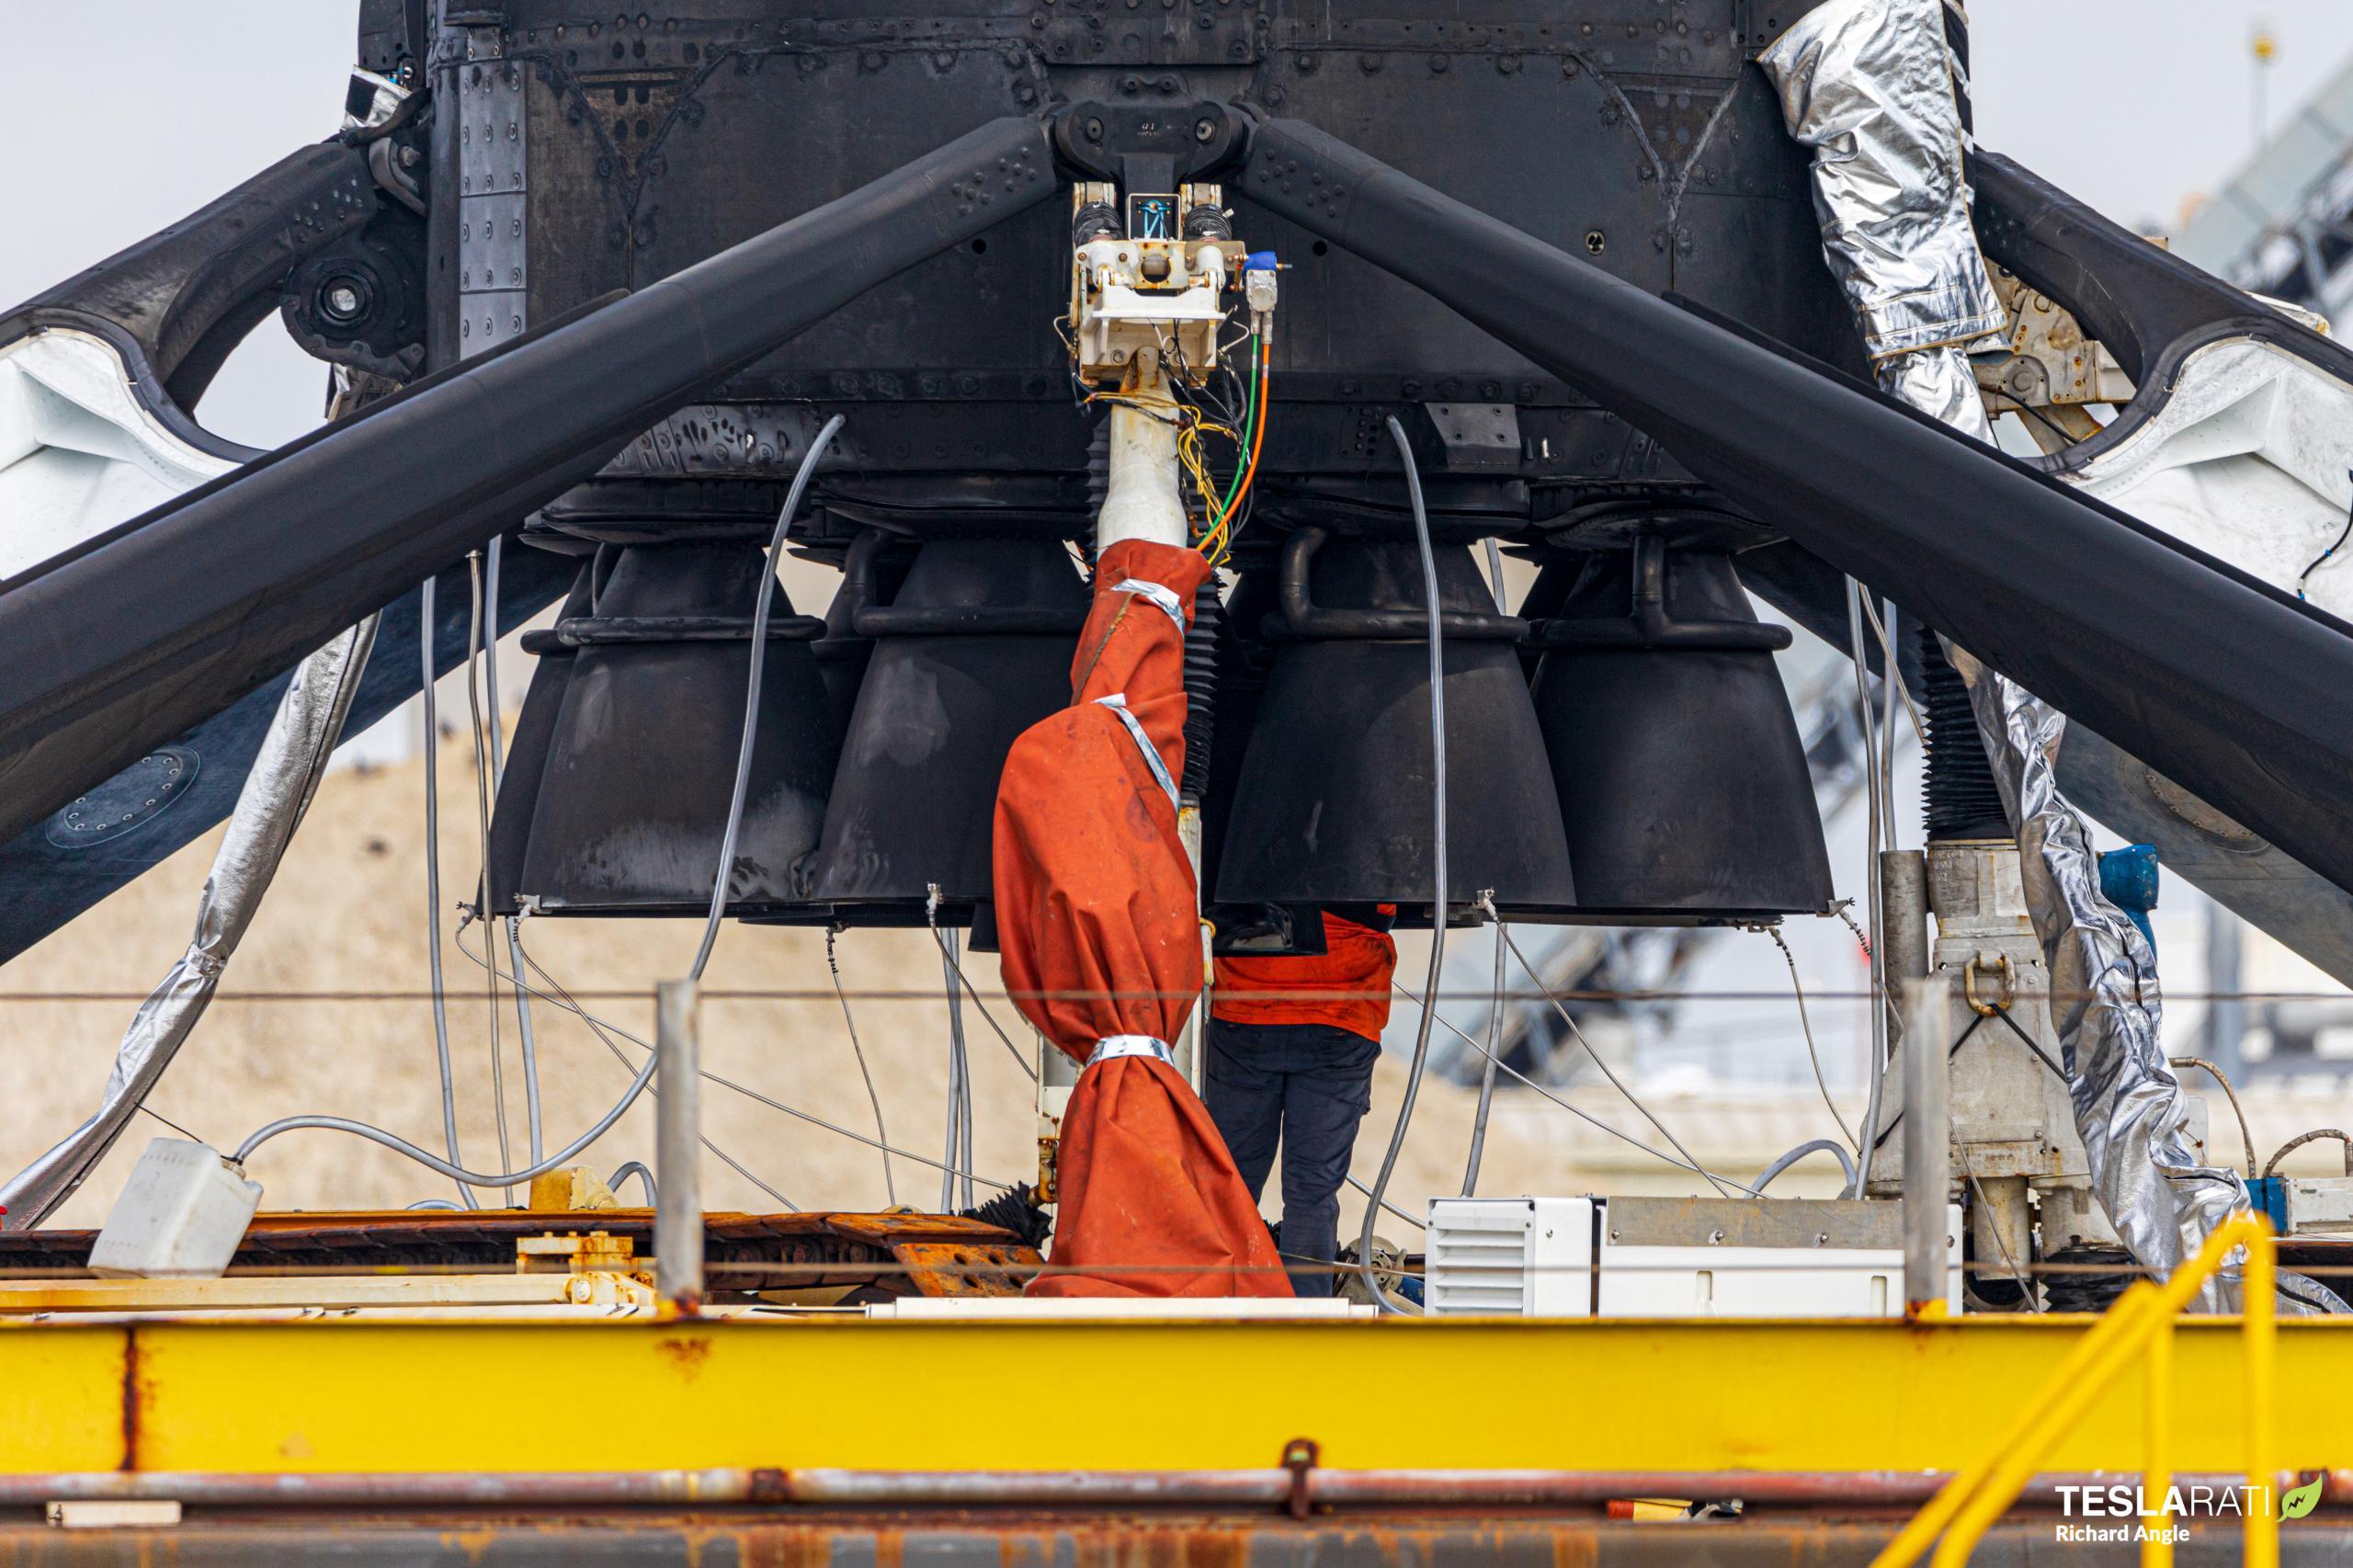 Transporter-1 Falcon 9 B1058 012621 (Richard Angle) octaweb 1 (c)